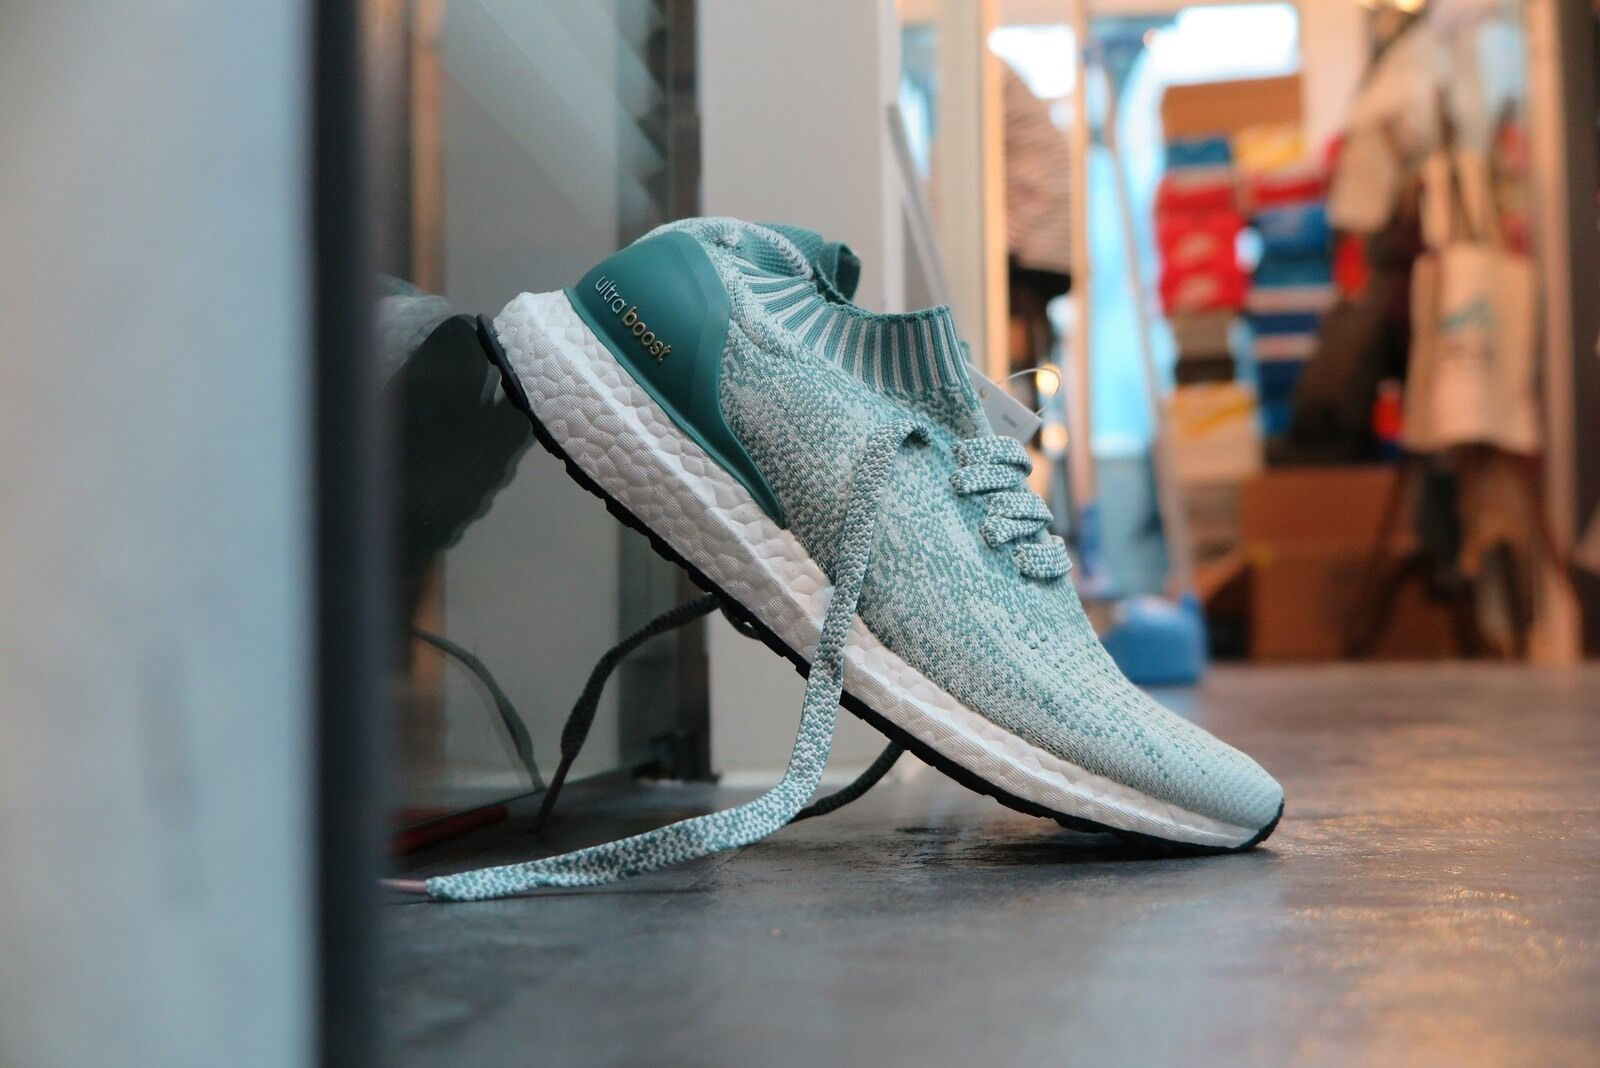 f8e80be99 ... Shoes Adidas Ultra Boost Uncaged BB3905 Women s Women s Women s Running  ...